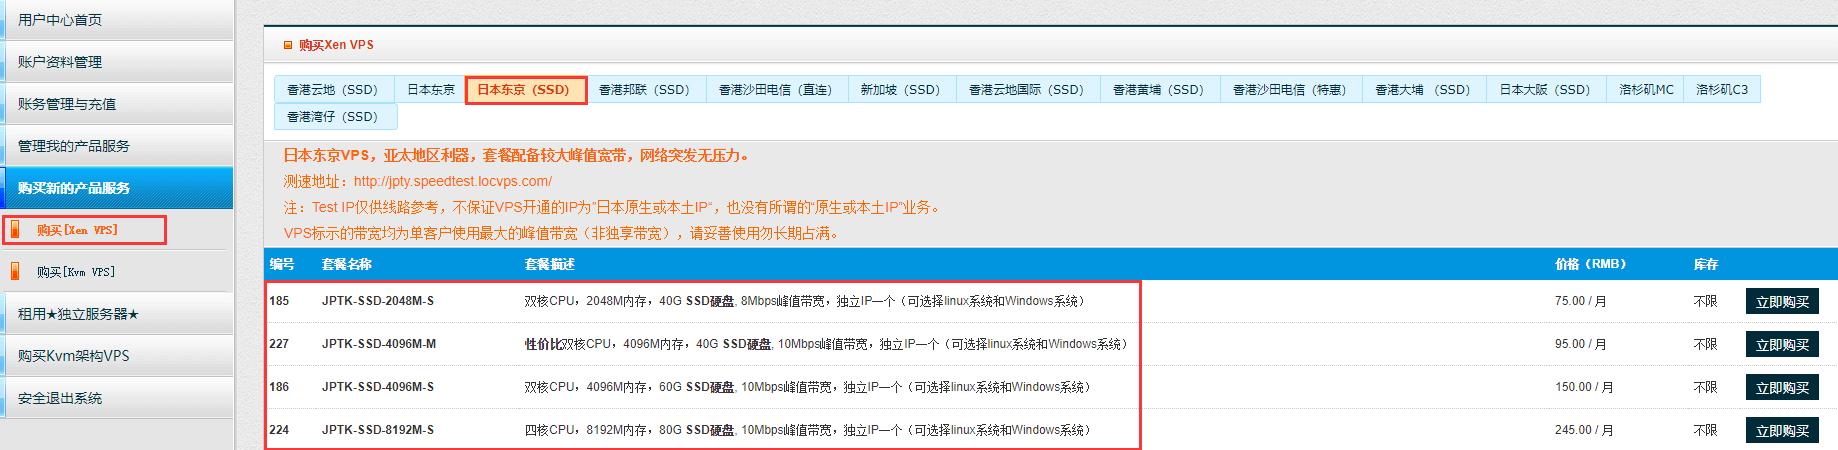 LOCVPS,双12返场活动,终身尊享65折优惠,免备案建站业务的日本CN2 VPS,2核心2G内存,8Mbps带宽,44.2元每月-主机参考